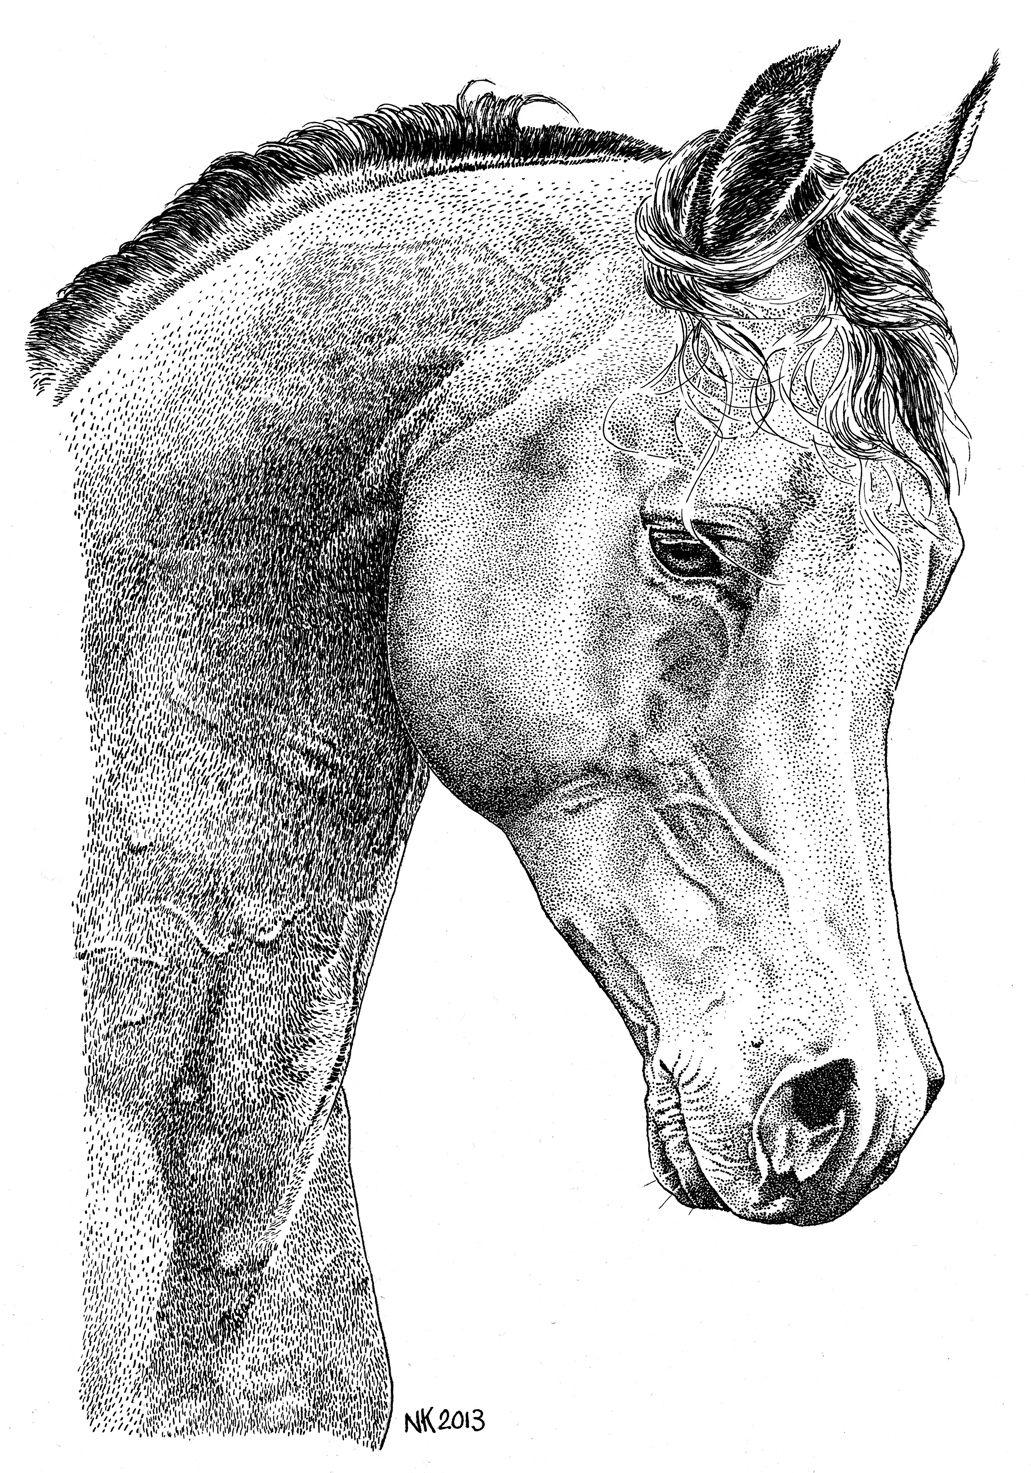 Nardja Kerkmeer Portretten En Tekeningen Inkt Pentekeningen Paard Tekeningen Inkt